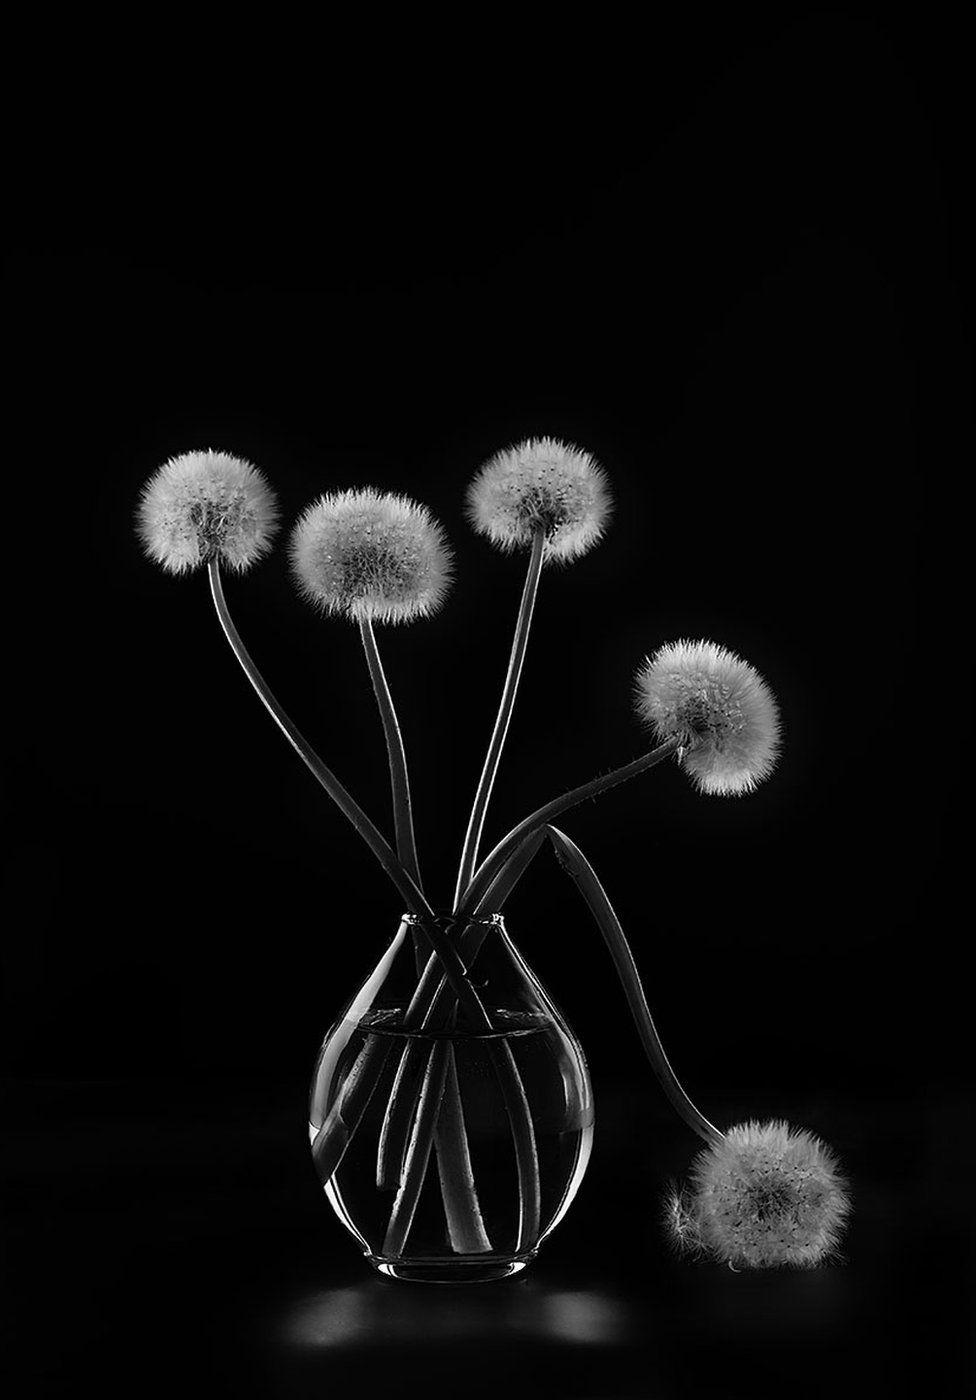 Dandelions in a glass vase